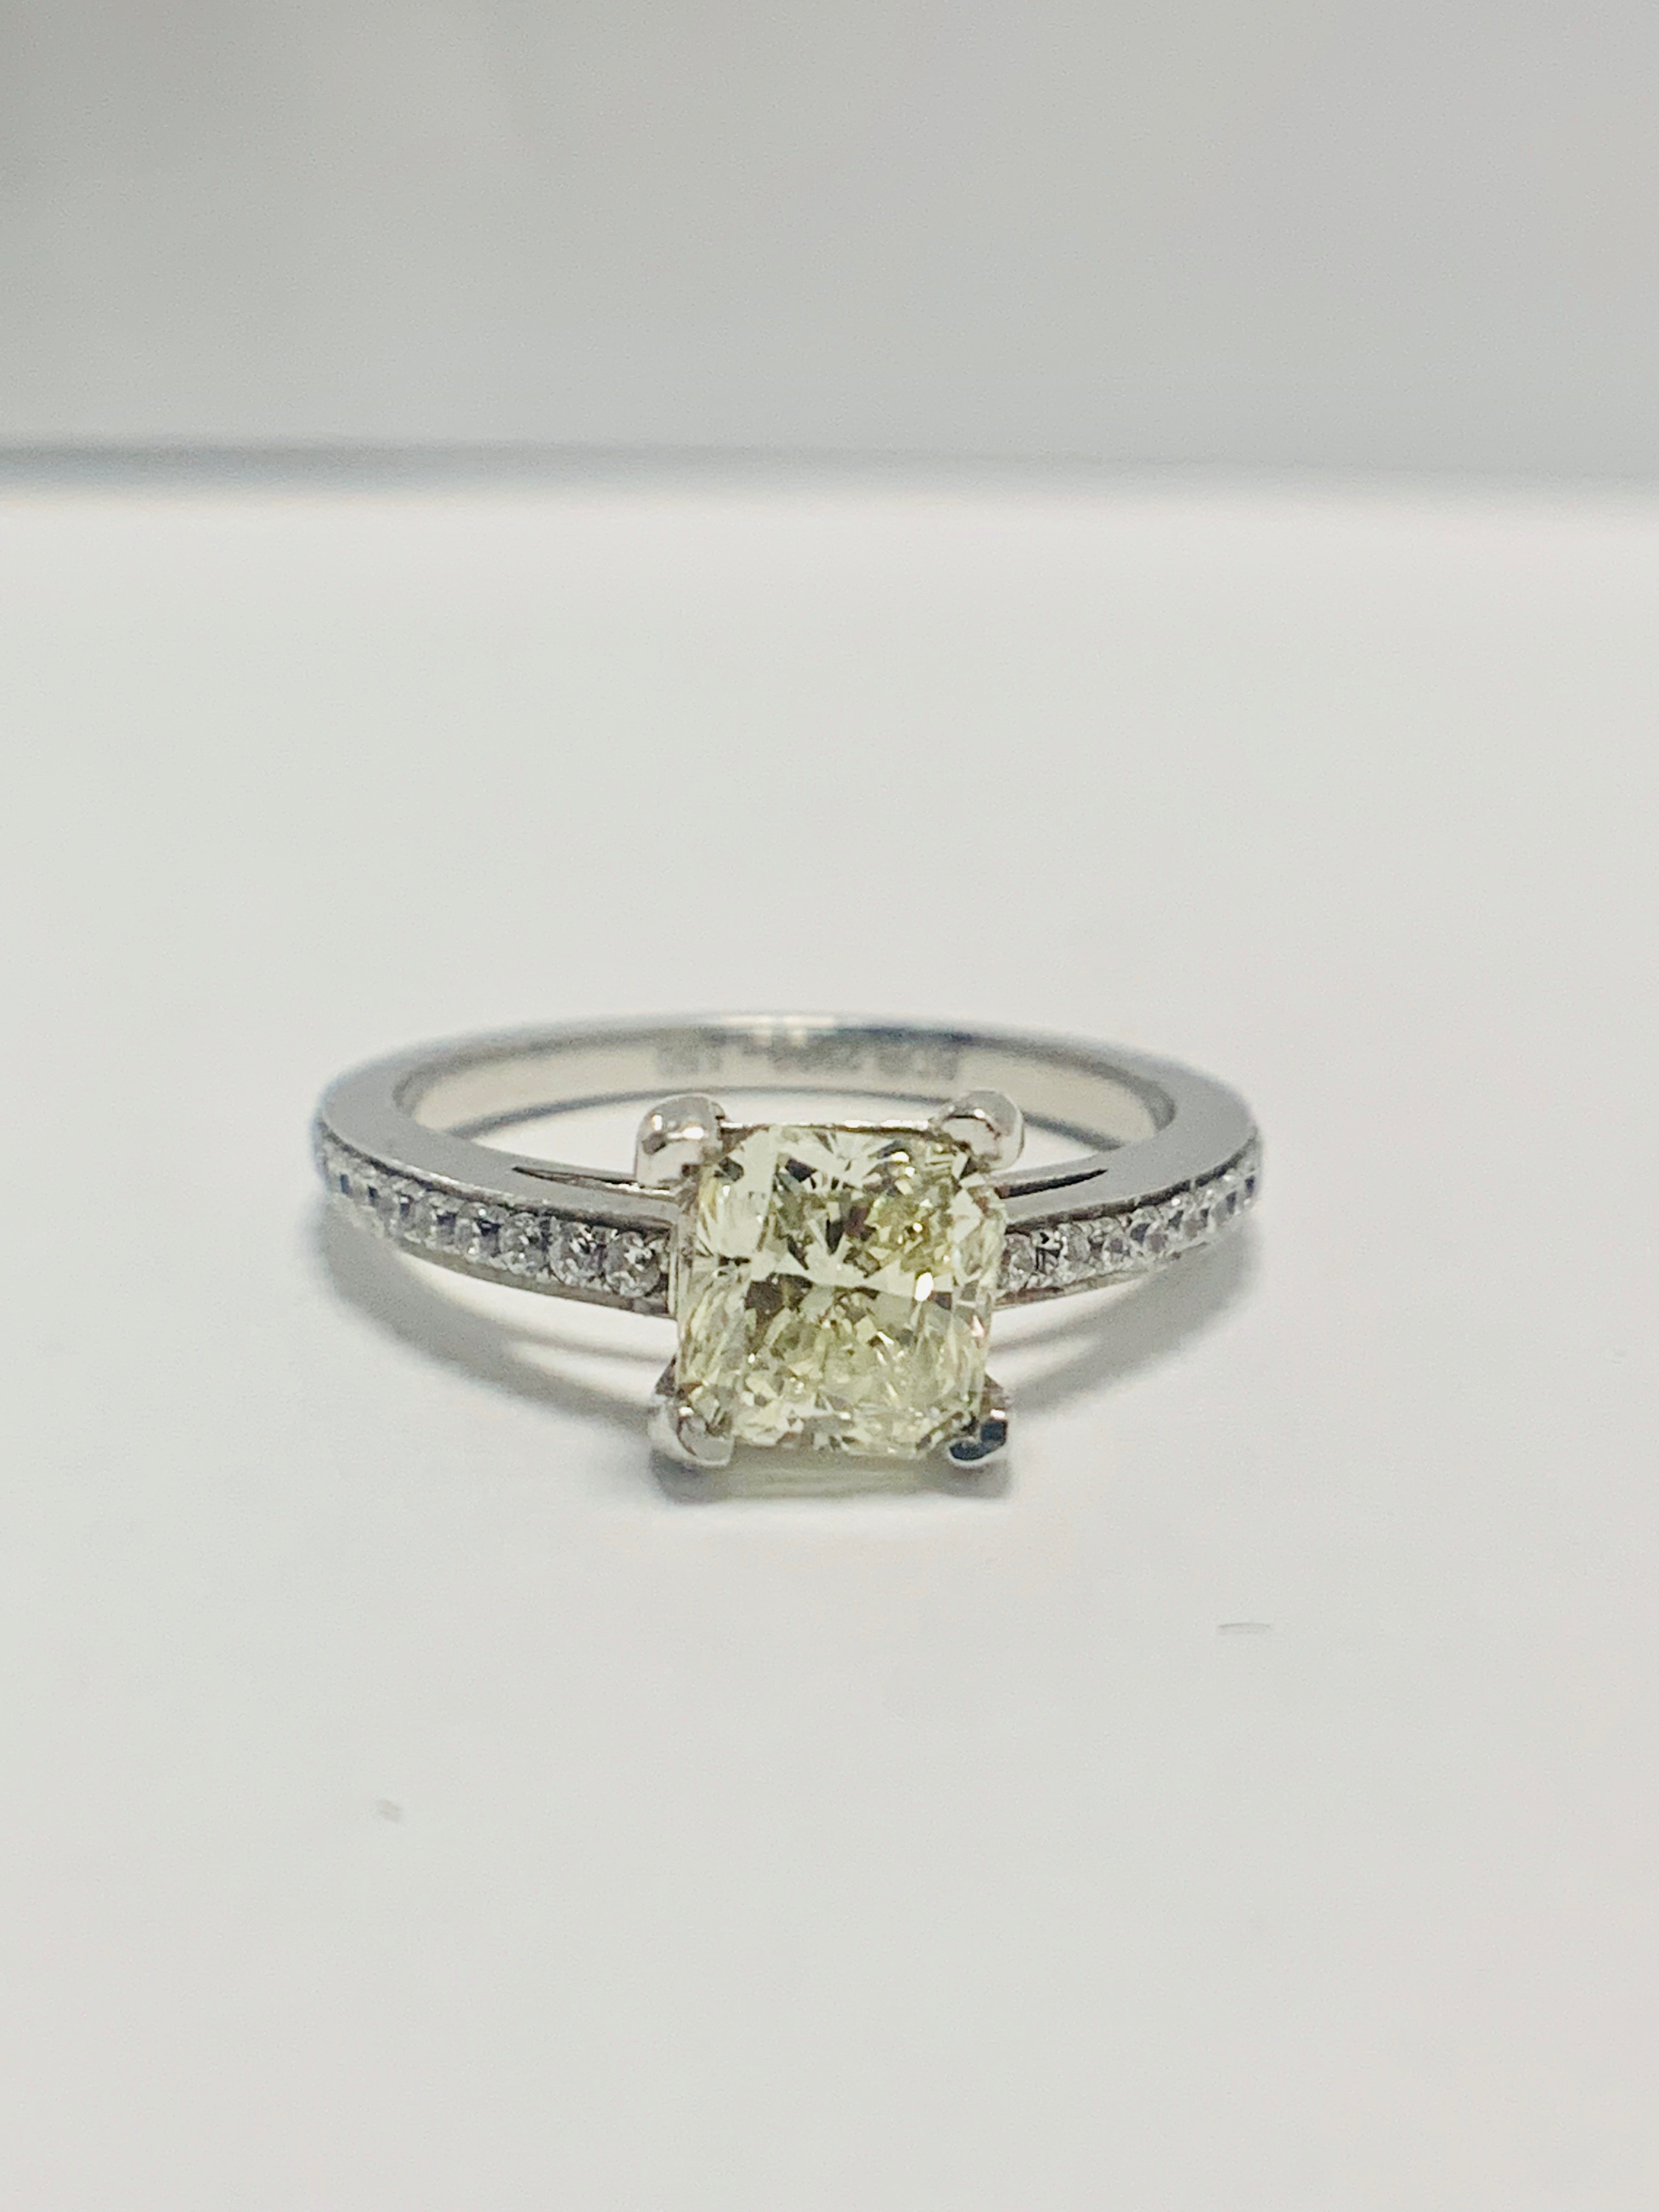 1ct cushion cut platinum diamond solitaire ring - Image 7 of 8